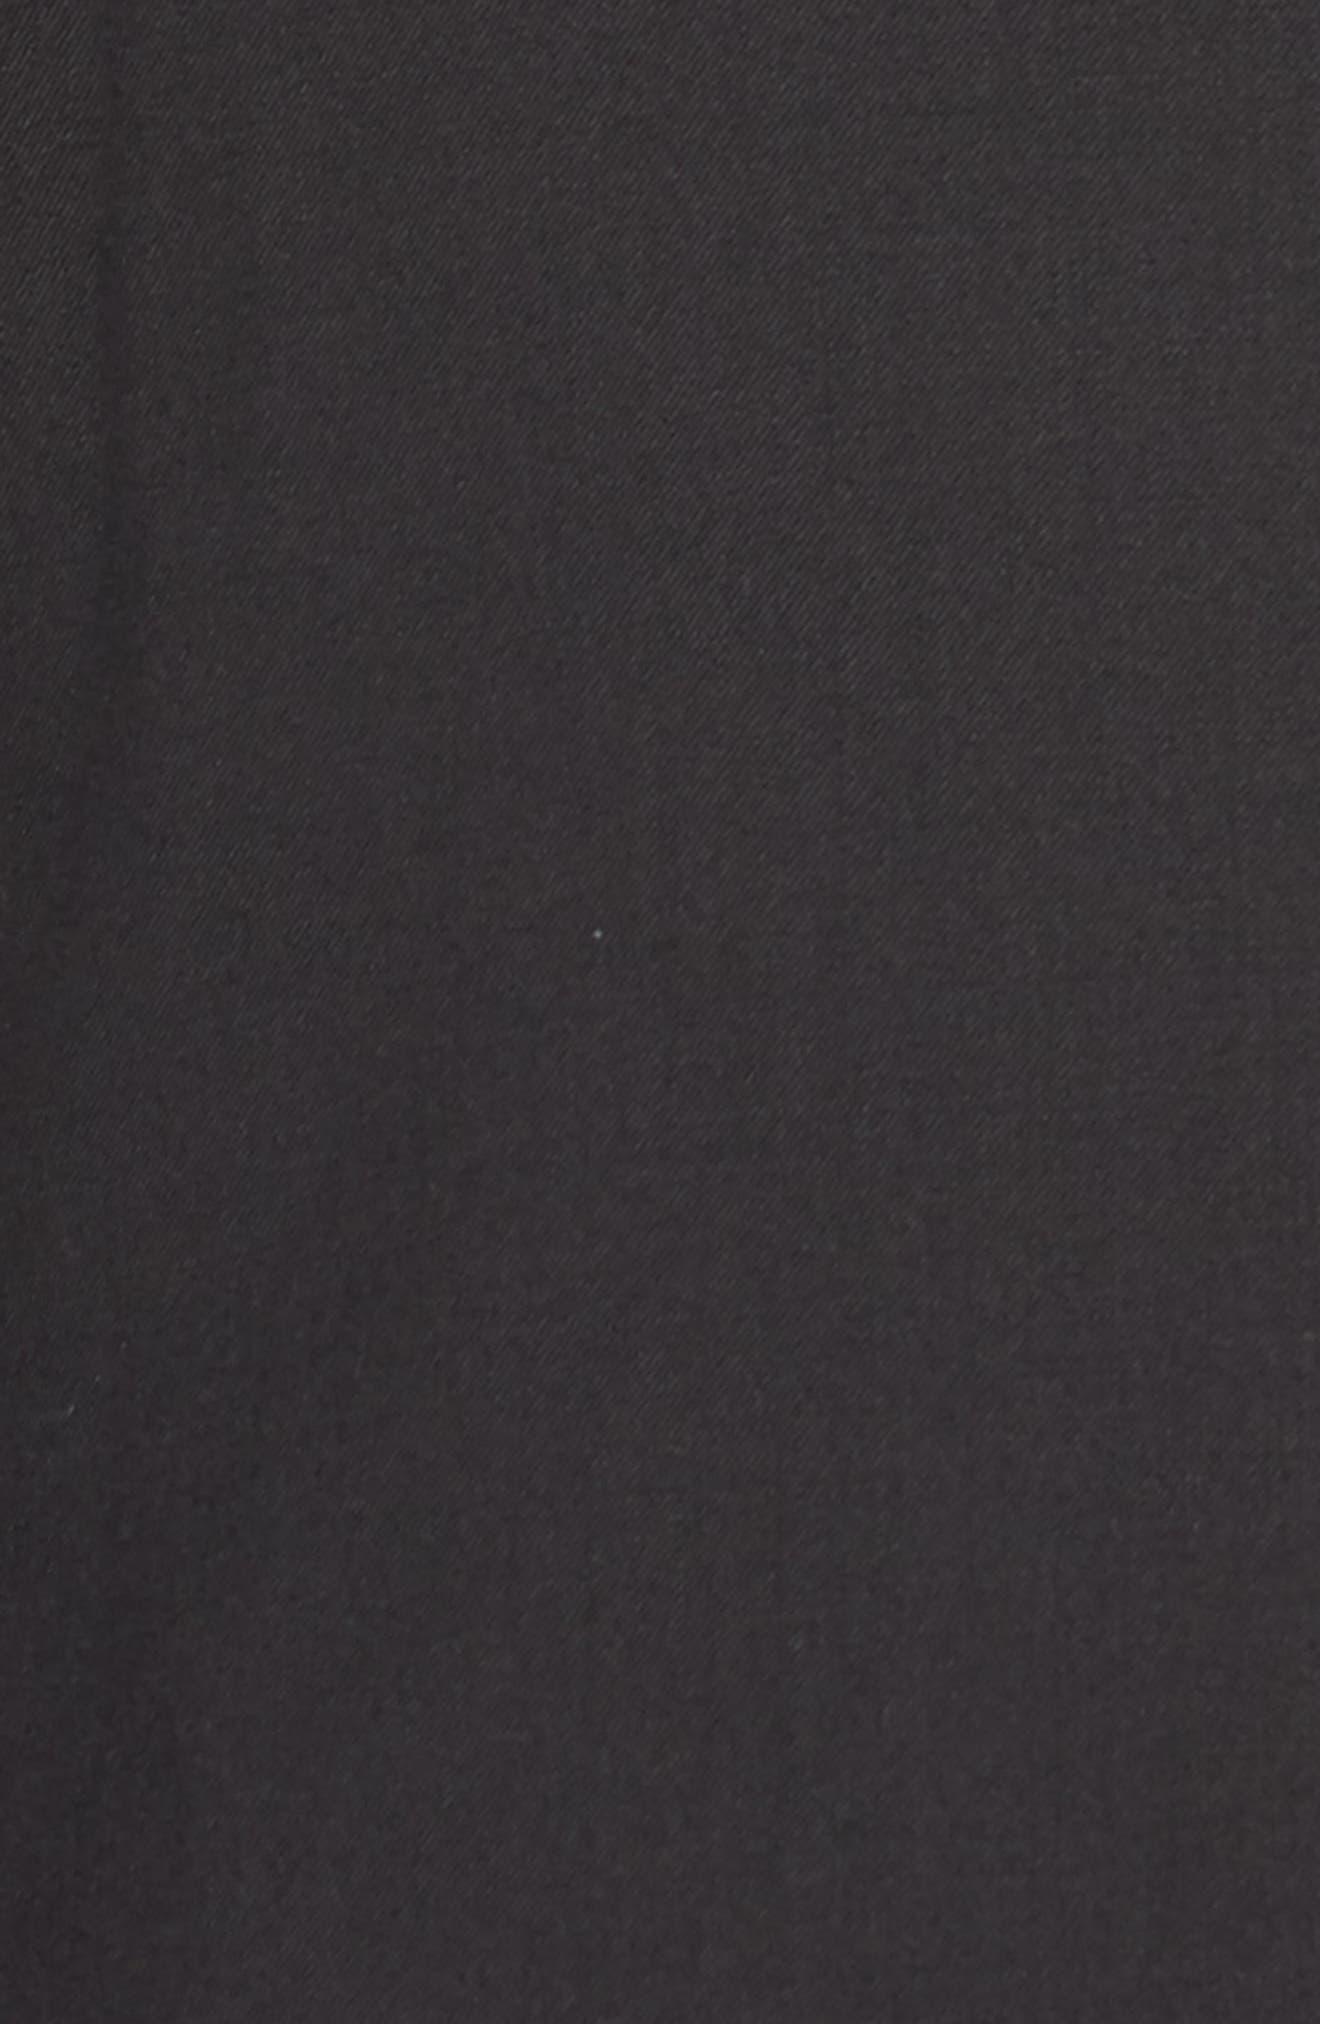 Halven/Gentry Trim Fit Wool Tuxedo,                             Alternate thumbnail 7, color,                             BLACK